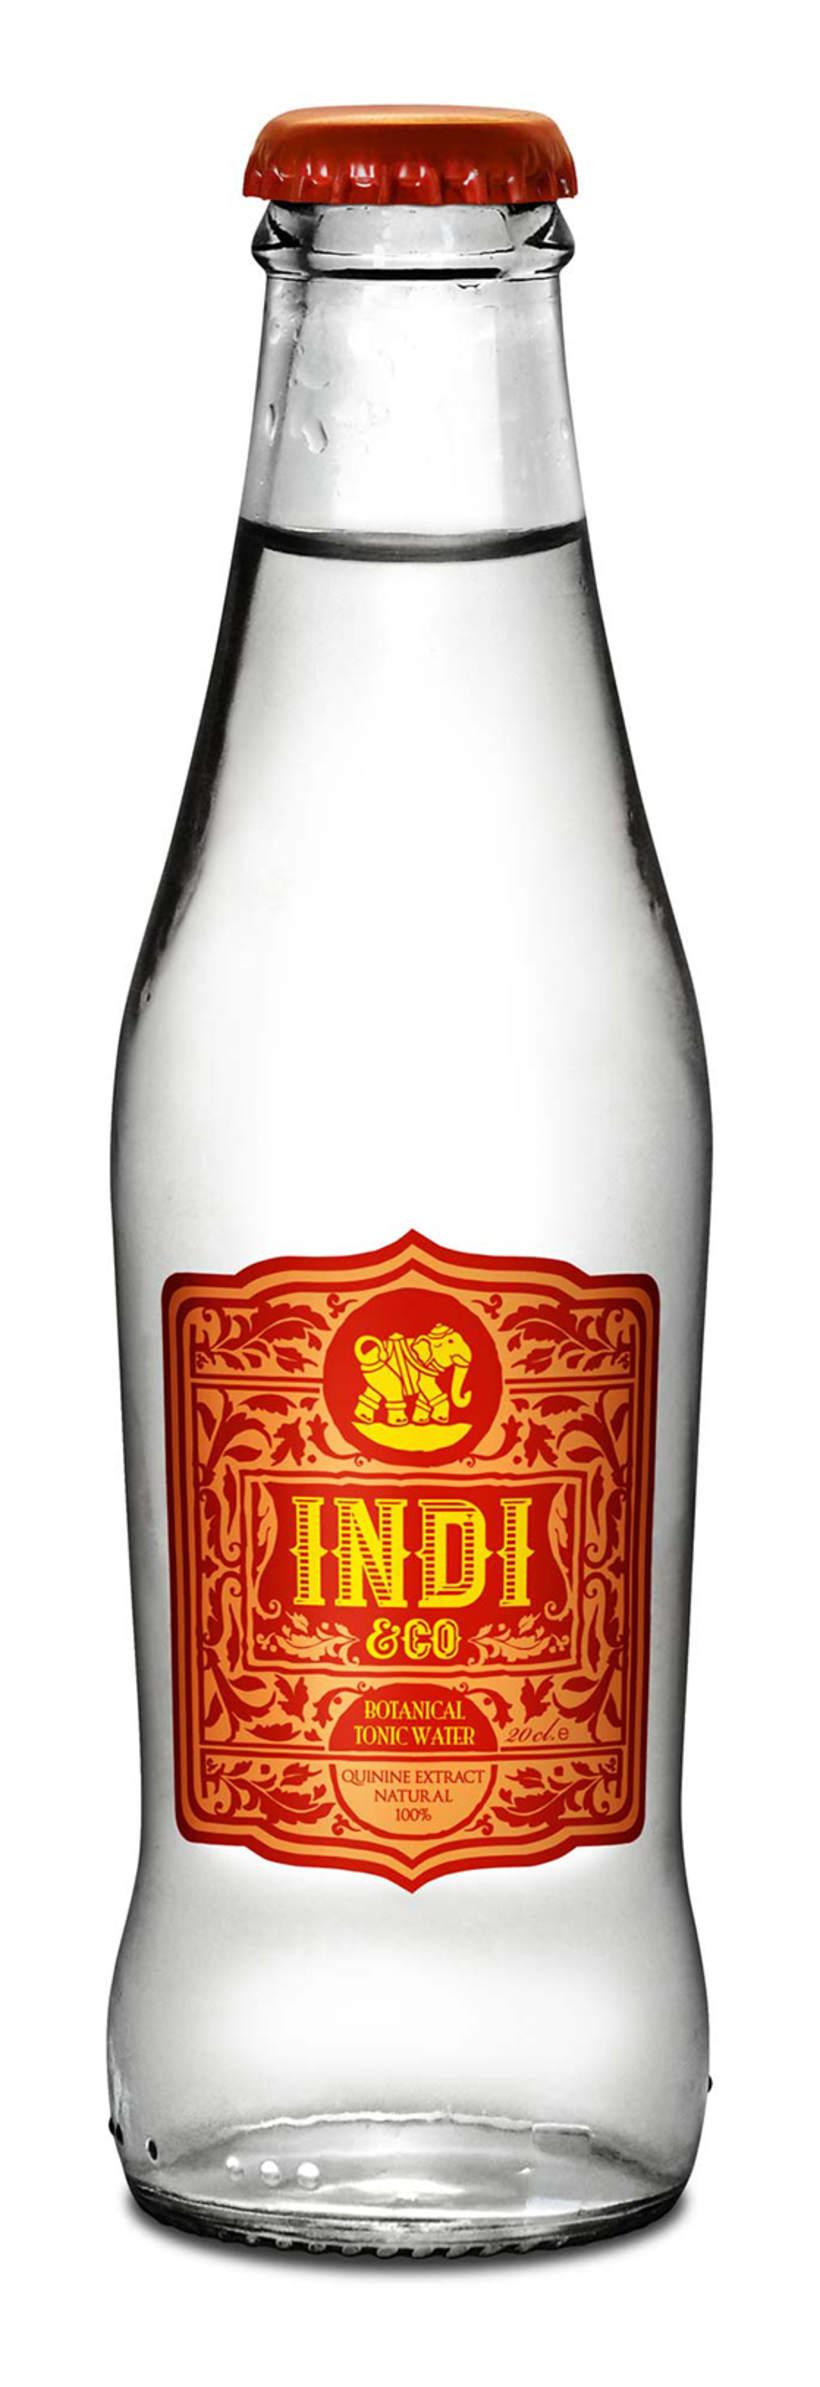 Tonica Indi 2